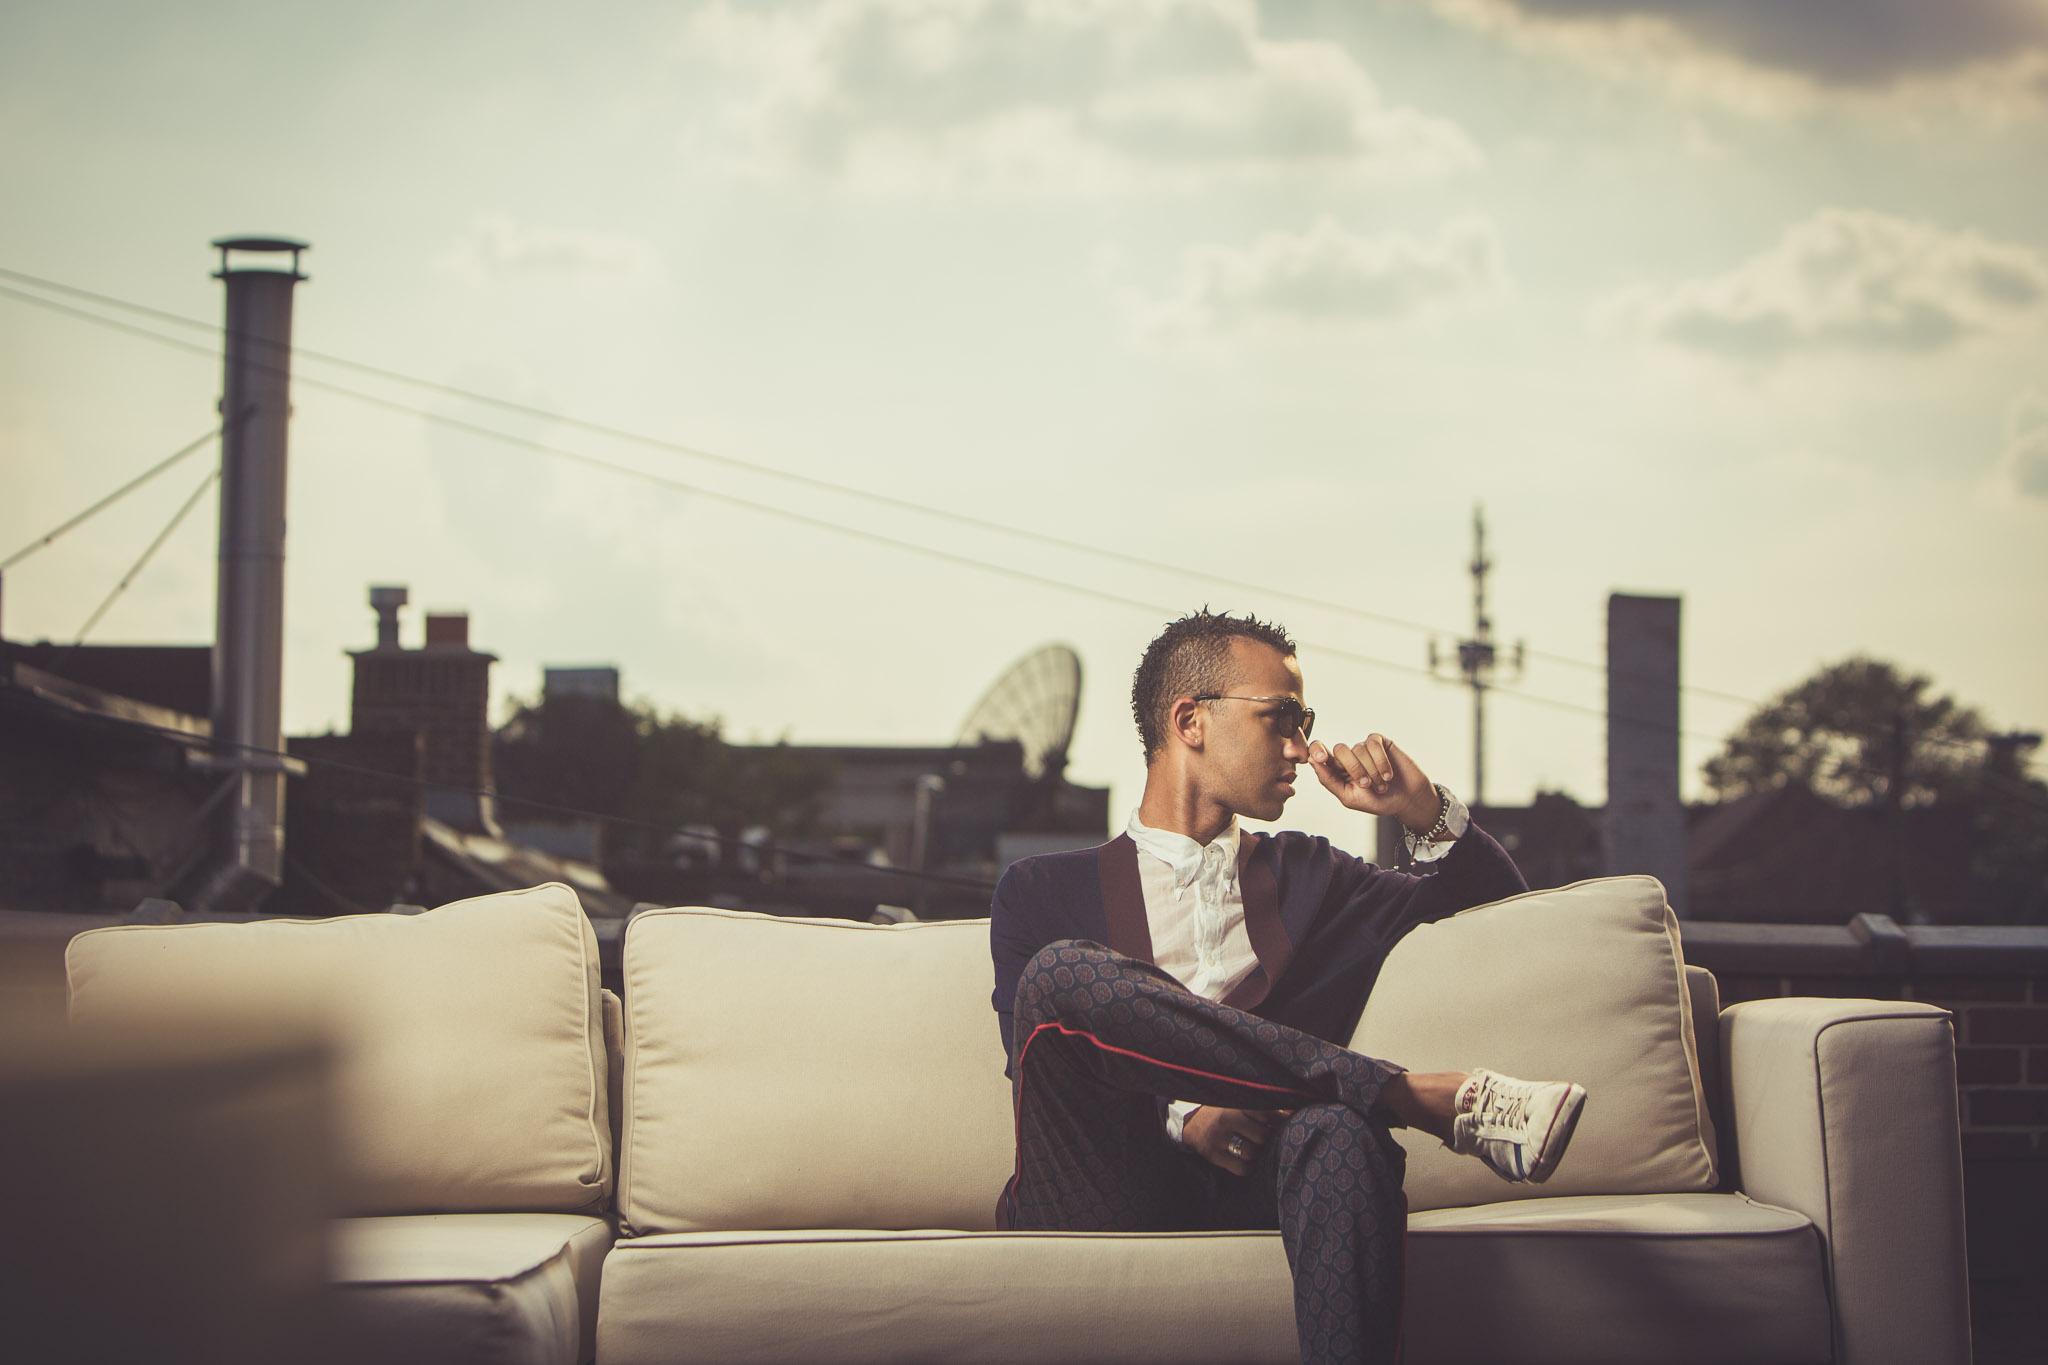 Shot on the roof of Studio 1176  wearing Dries Van Noten head-to-toe and sunglasses by Linda Farrow for Dries Van Noten